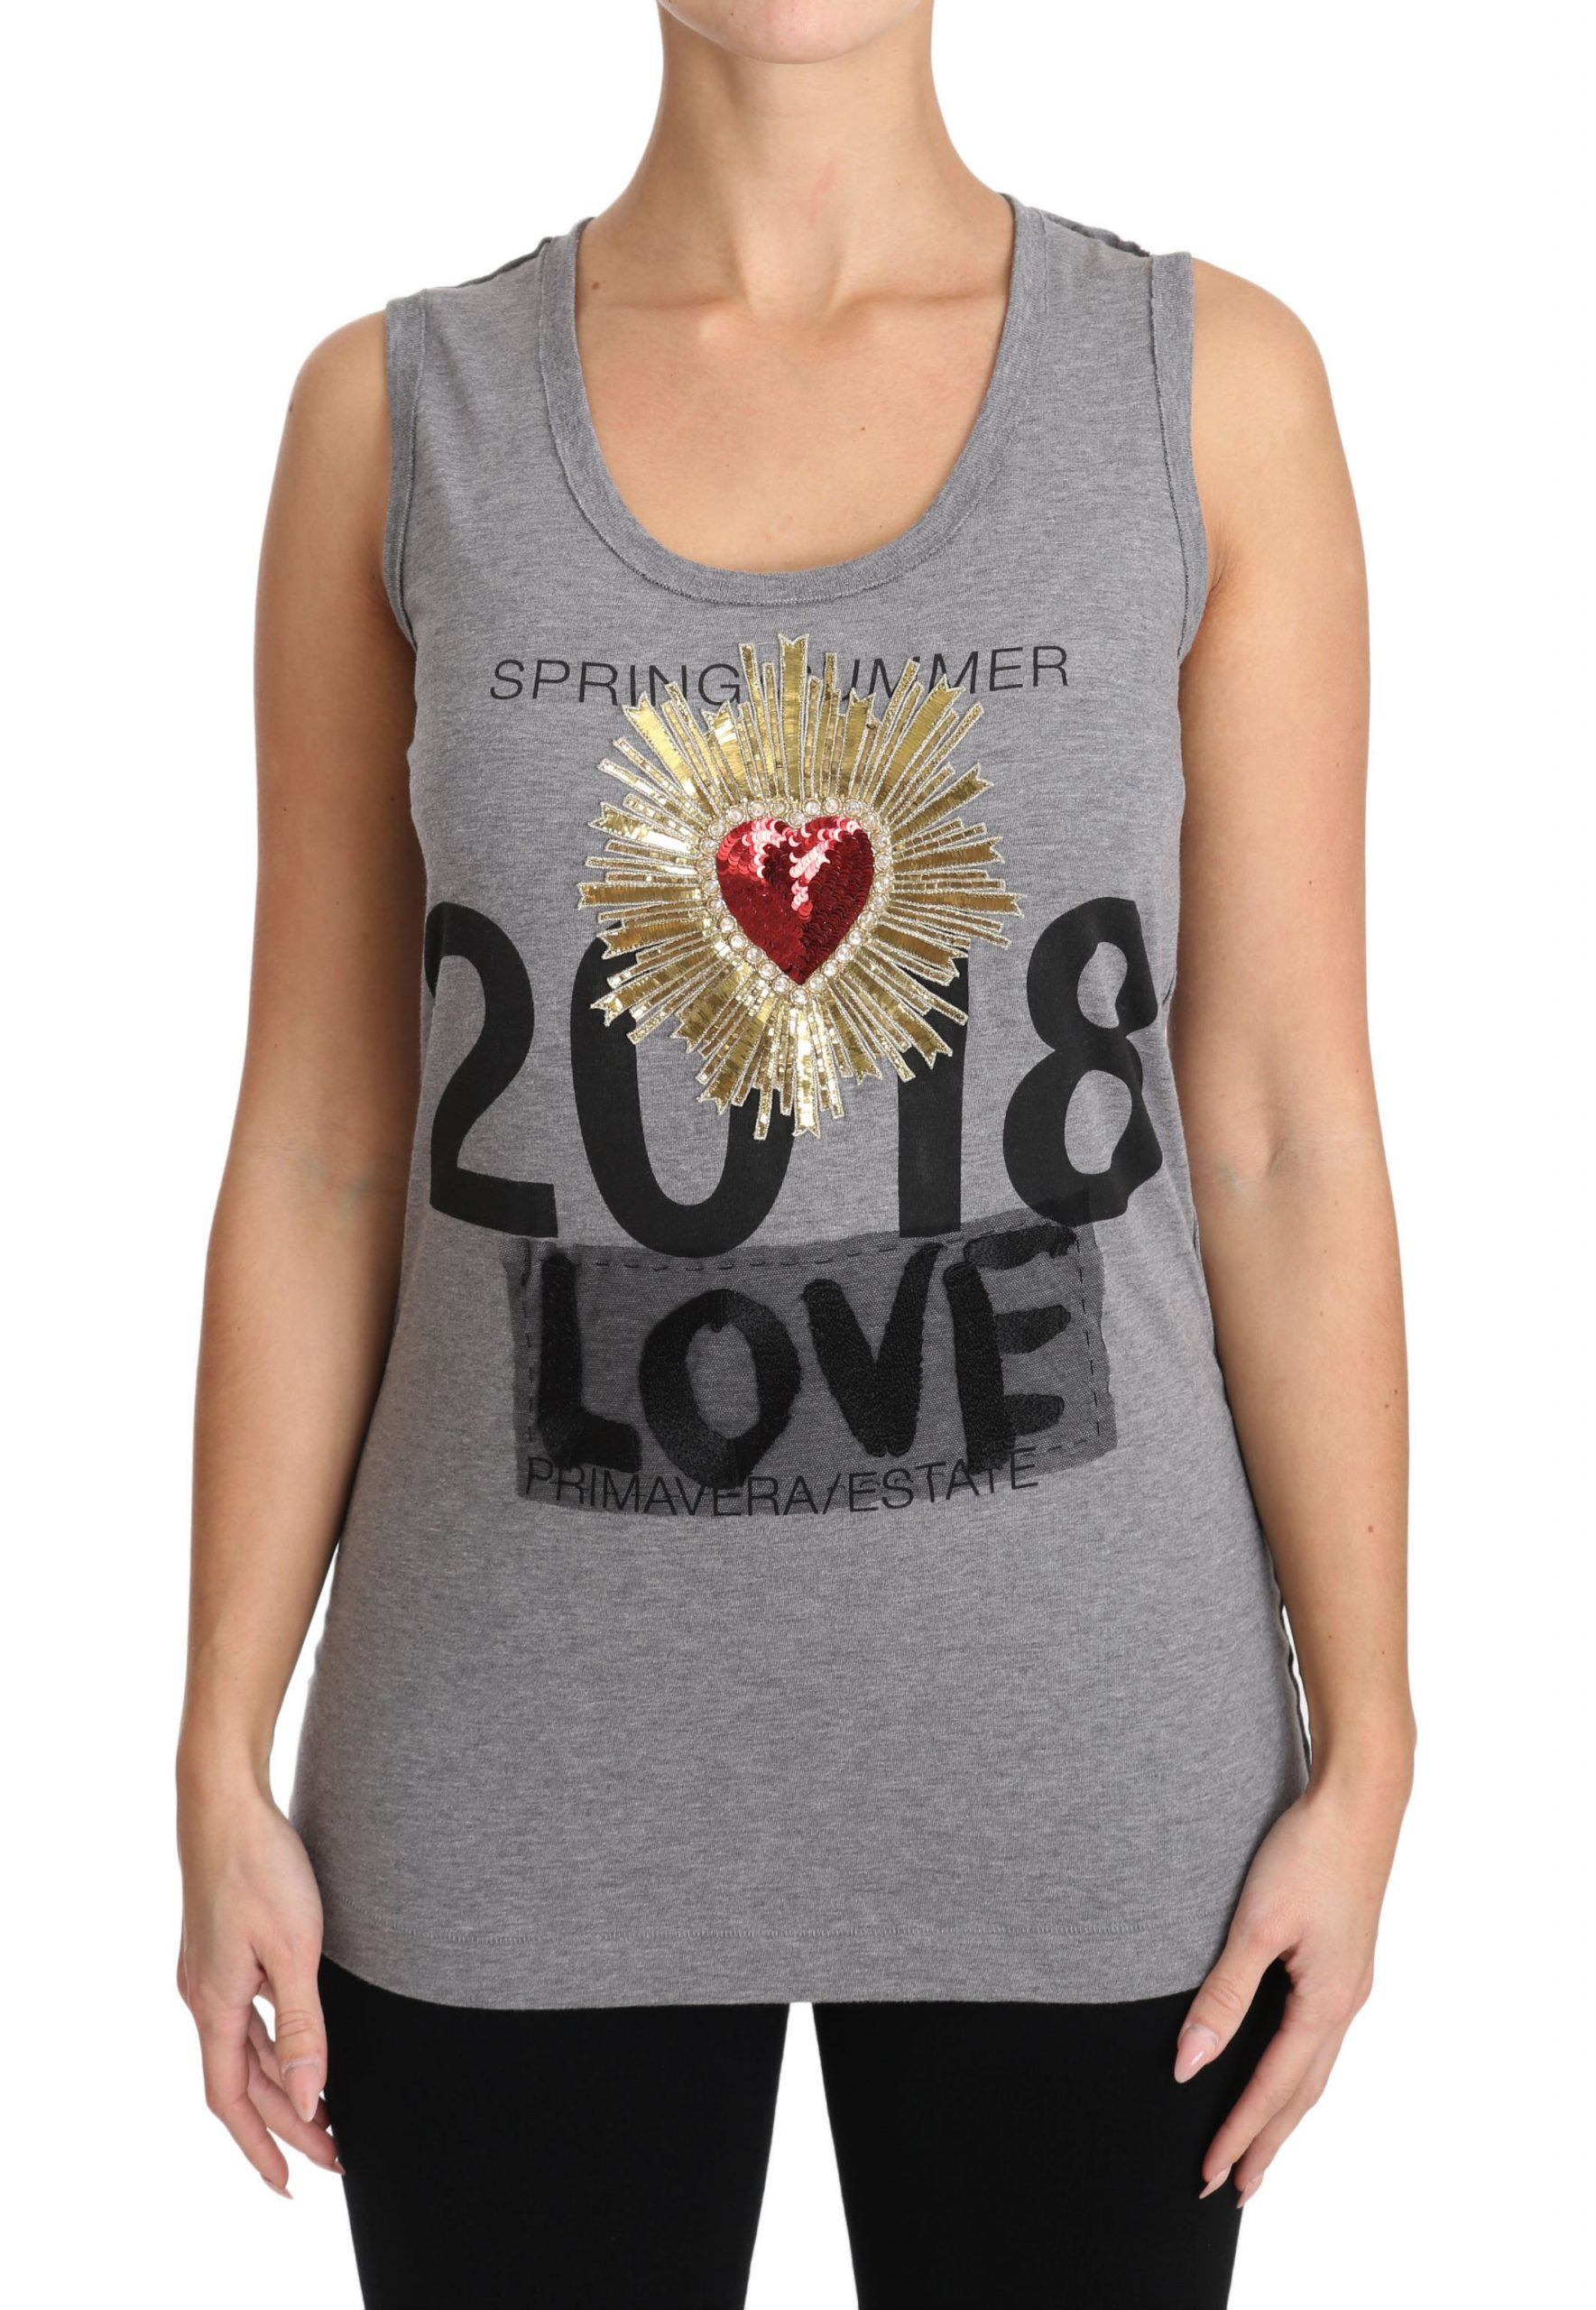 Dolce & Gabbana Women's Crystal Sequined Heart Tops Gray TSH2984 - IT38|XS